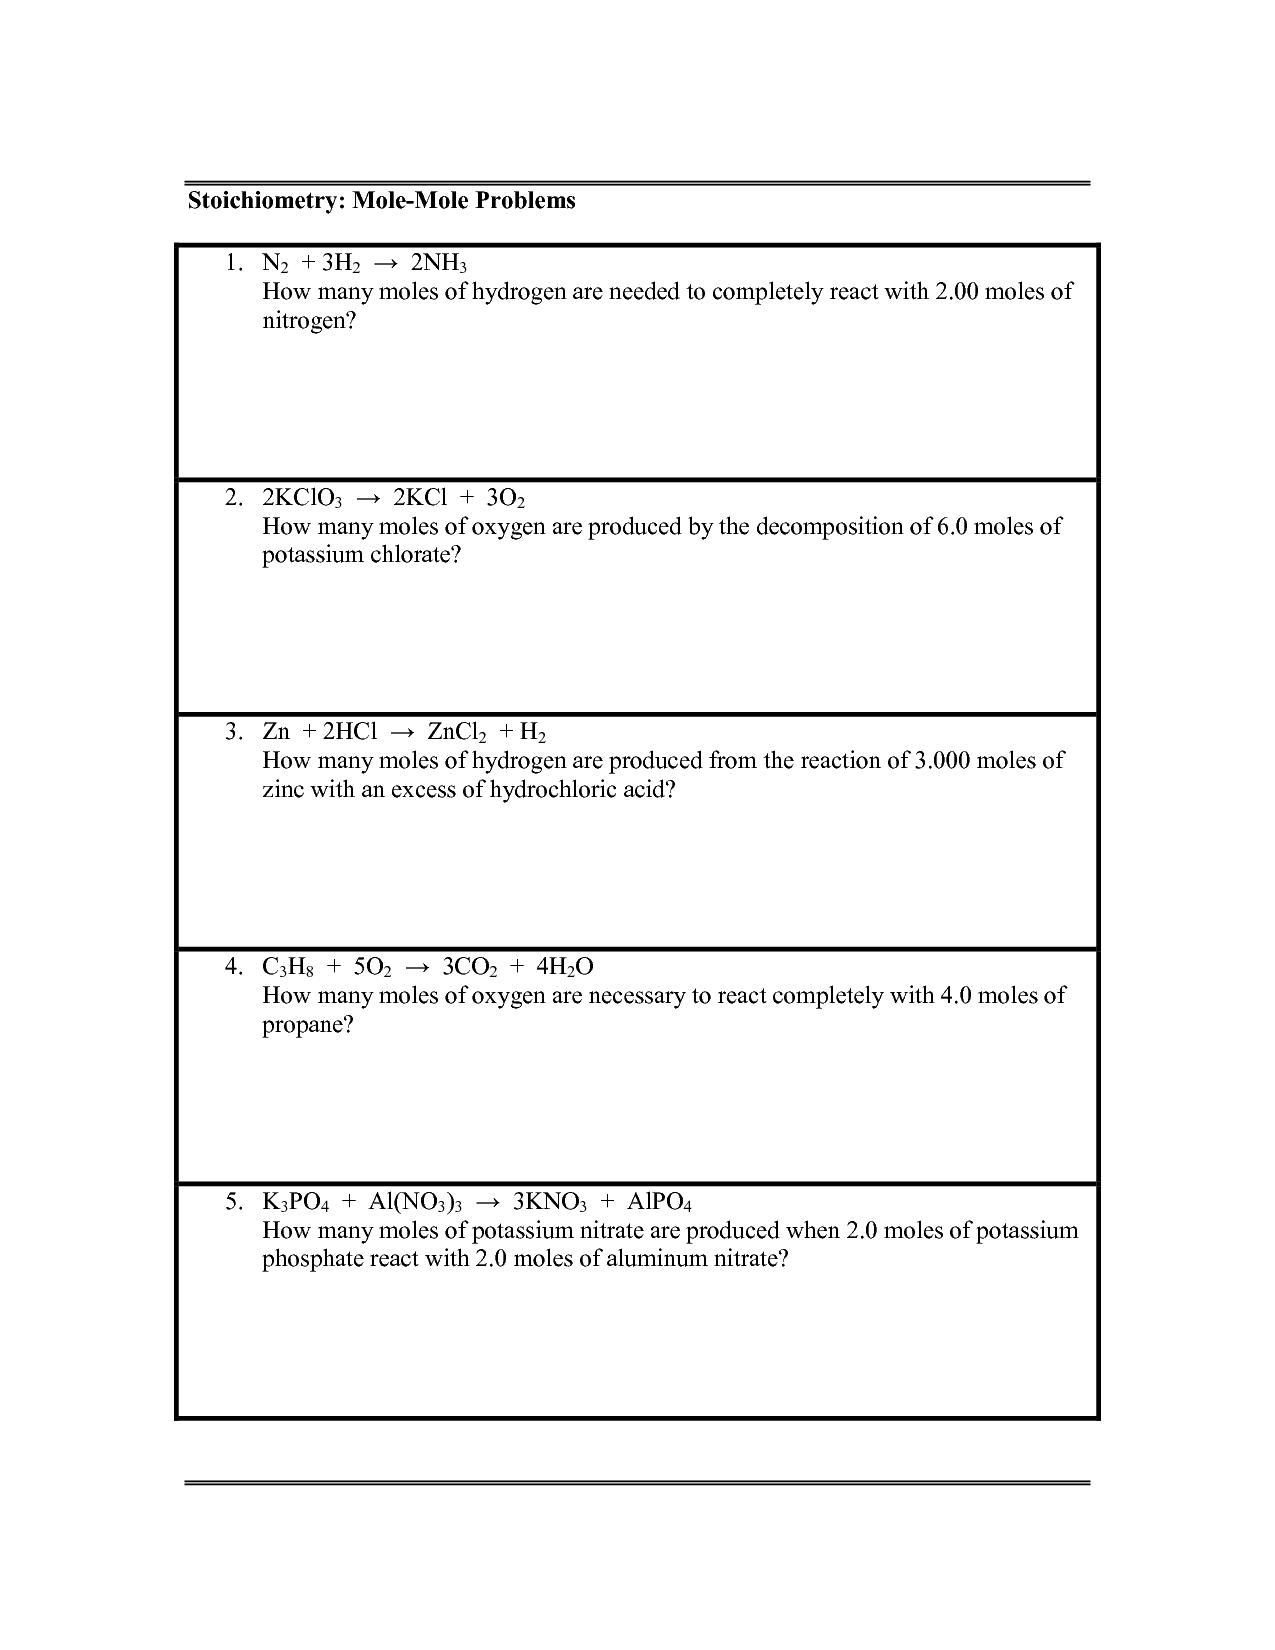 Stoichiometry Mole Mole Problems Worksheet Answers